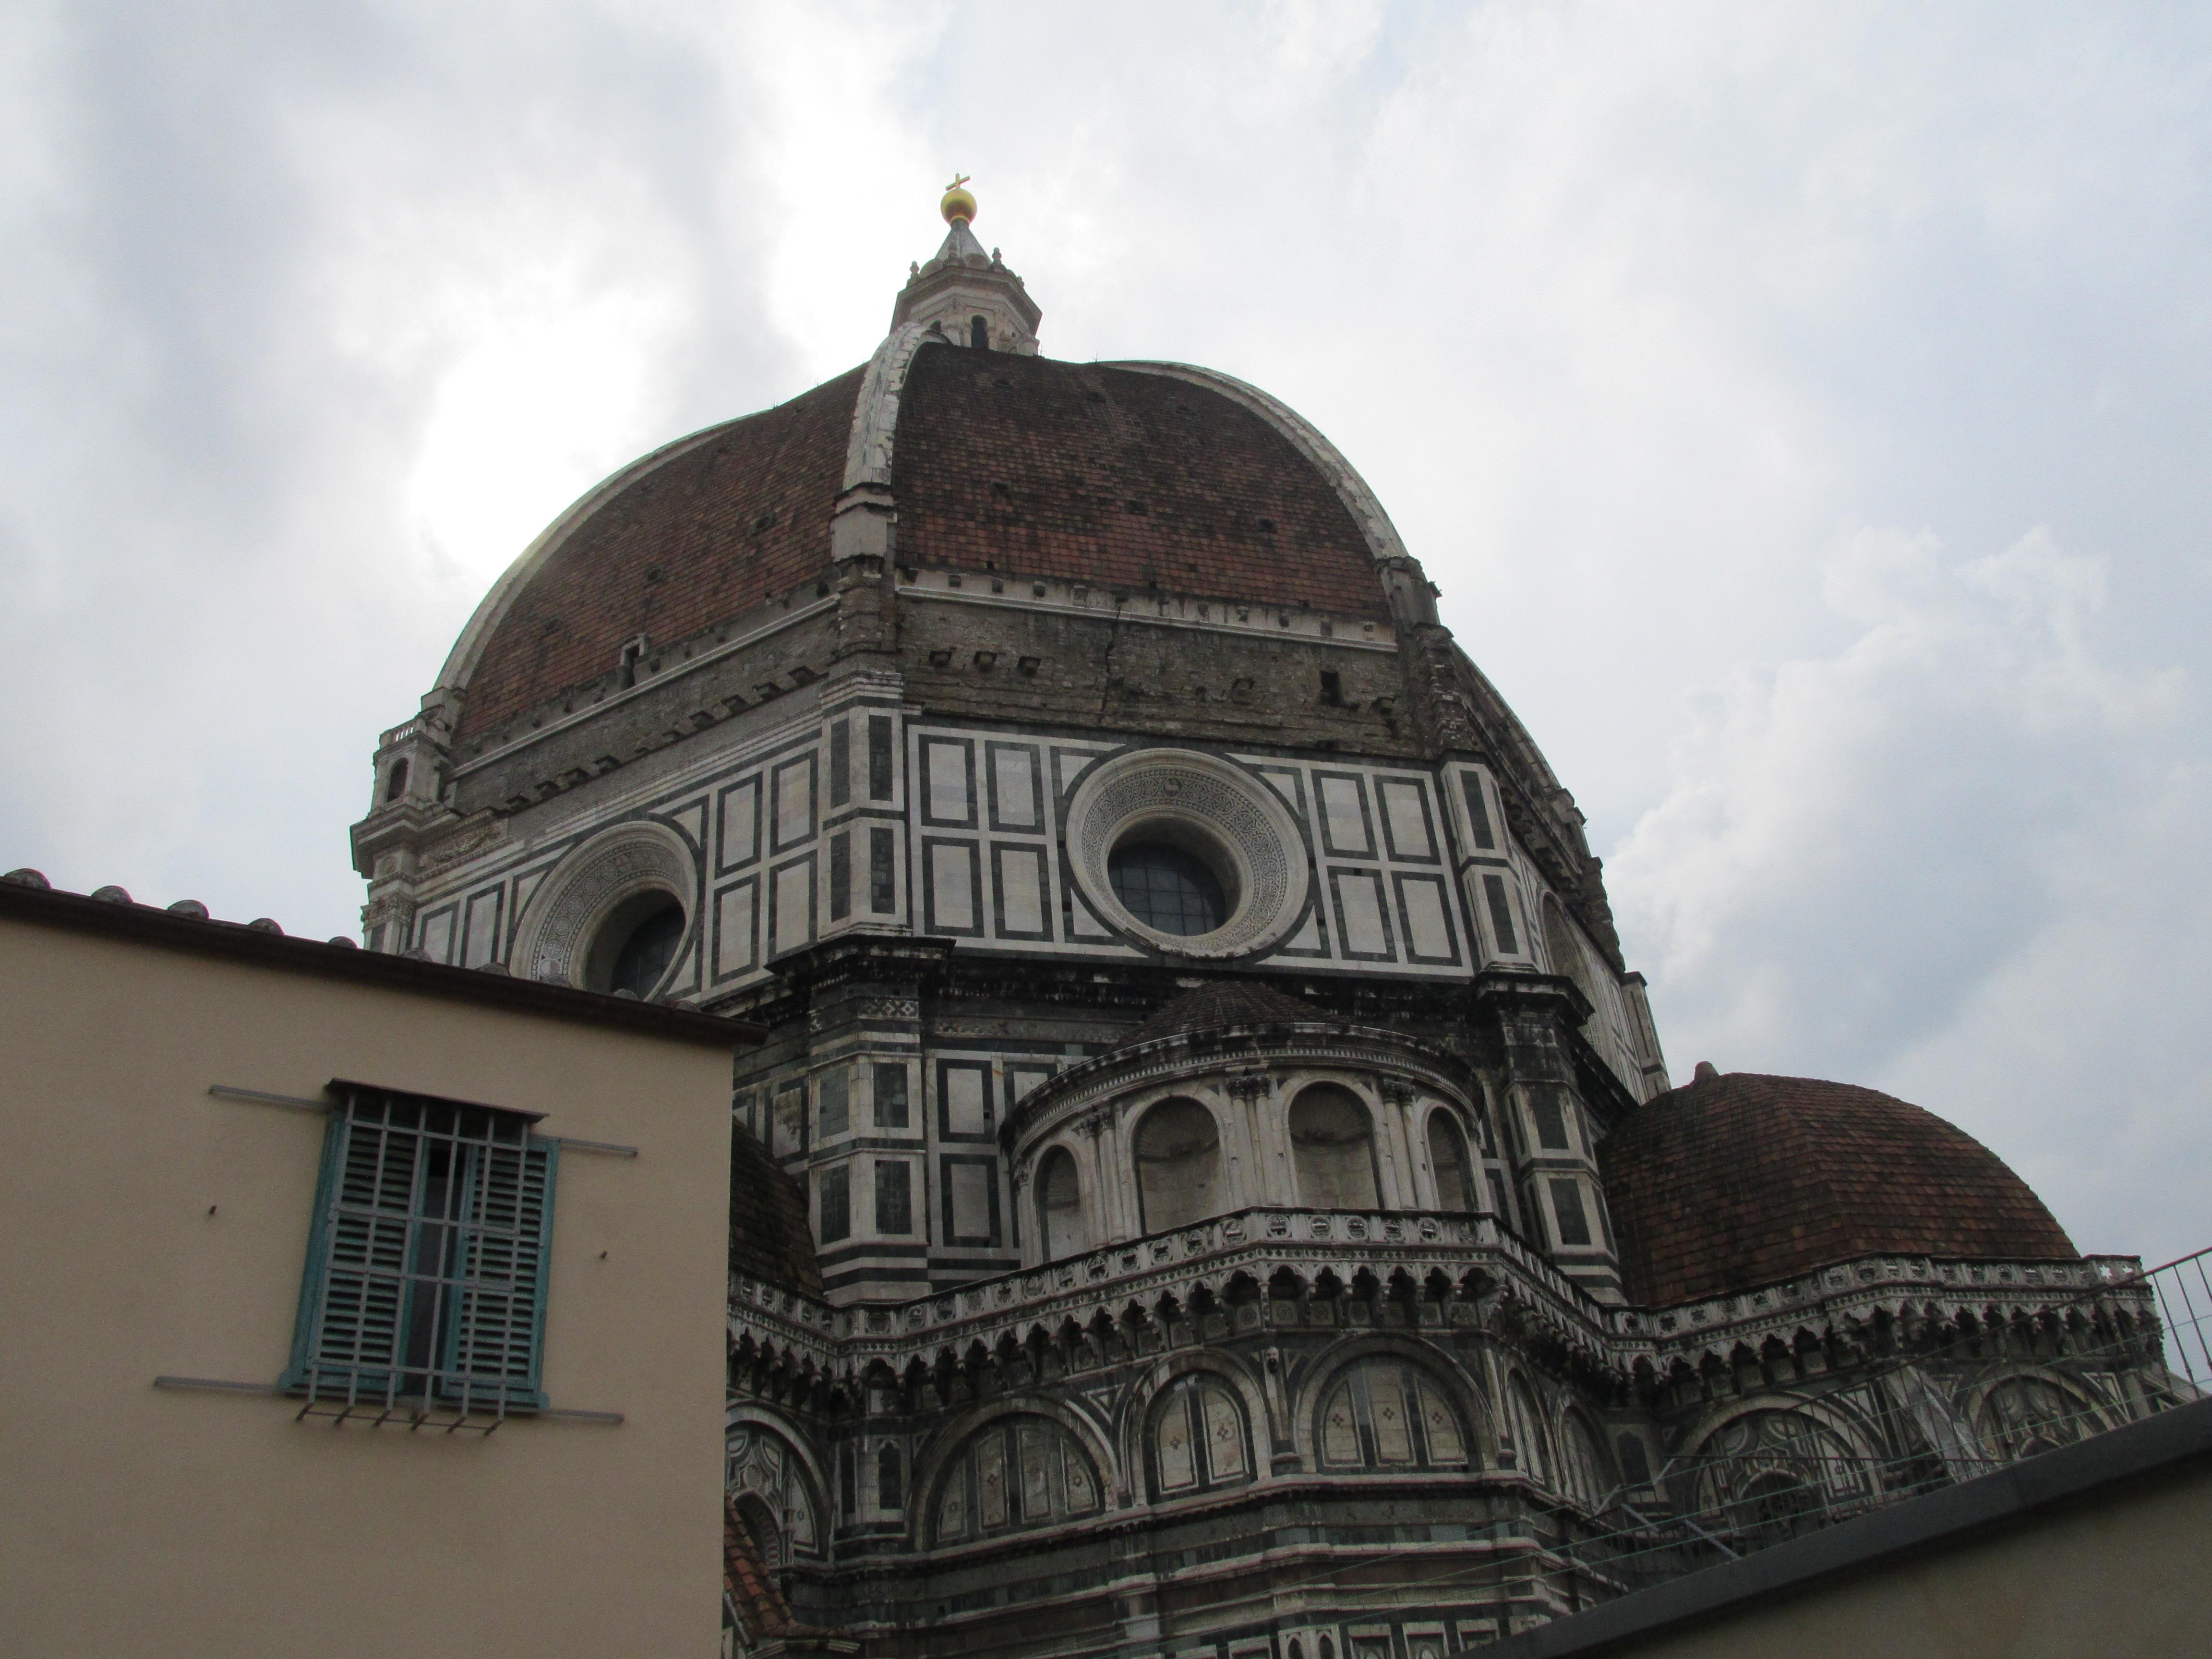 img 2840 - Visitando la Catedral Santa Maria del Fiore de Florencia I/III